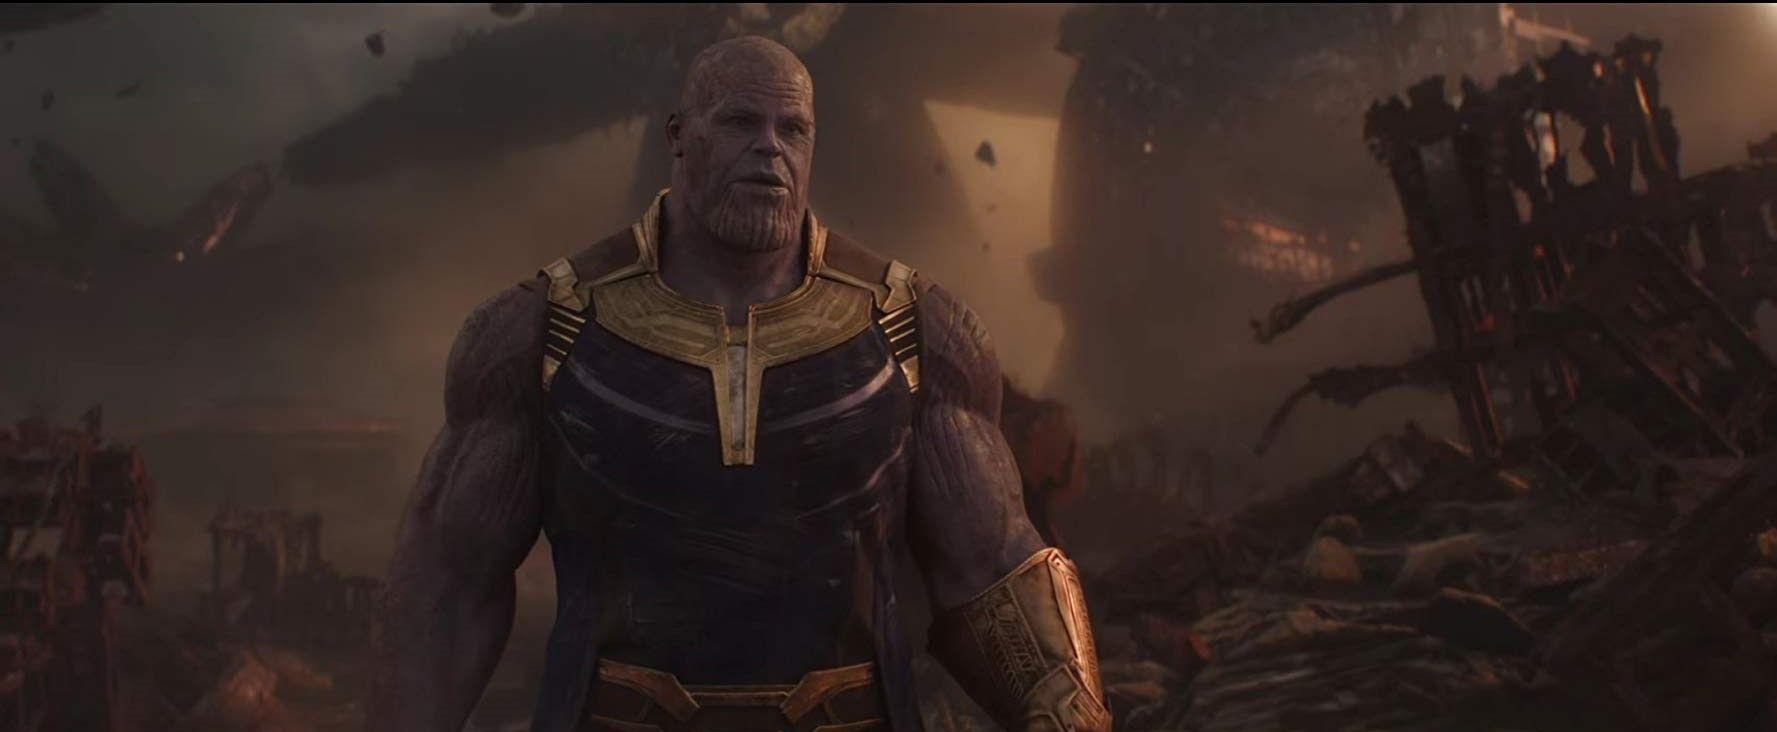 Avengers: Infinity War writer reveals 'The Snap' originally happened in Endgame